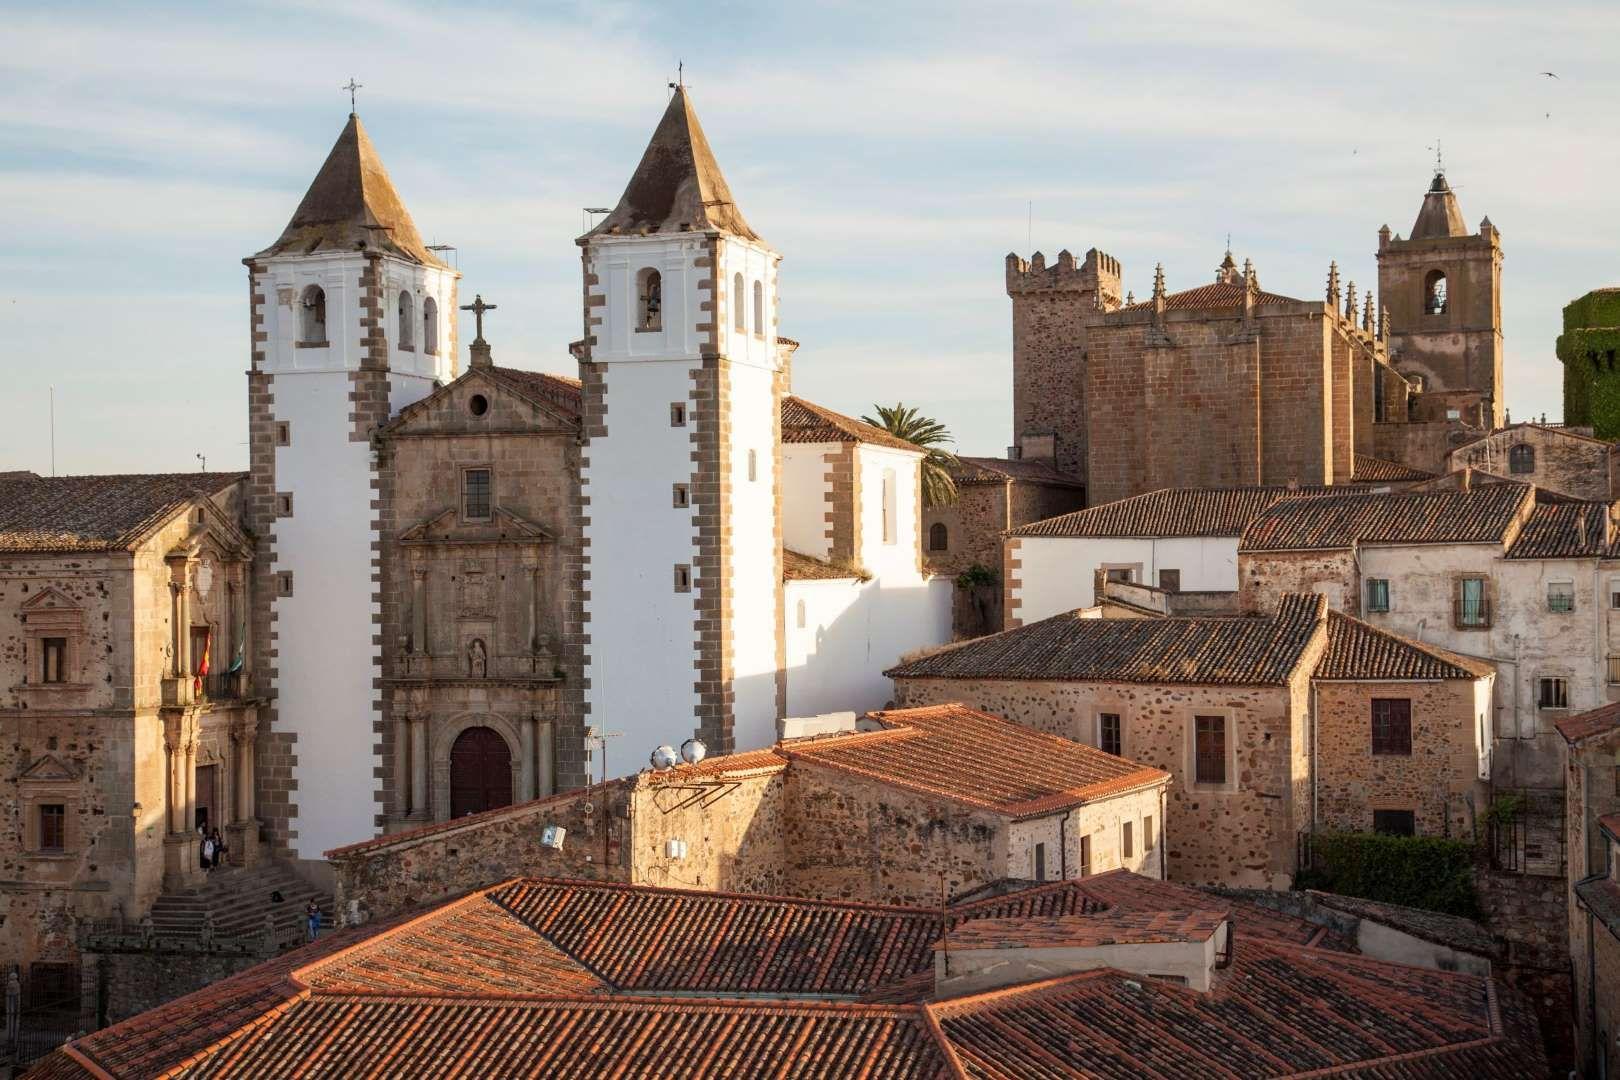 7.Extremadura, Spain - Santiago Urquijo/Getty Images